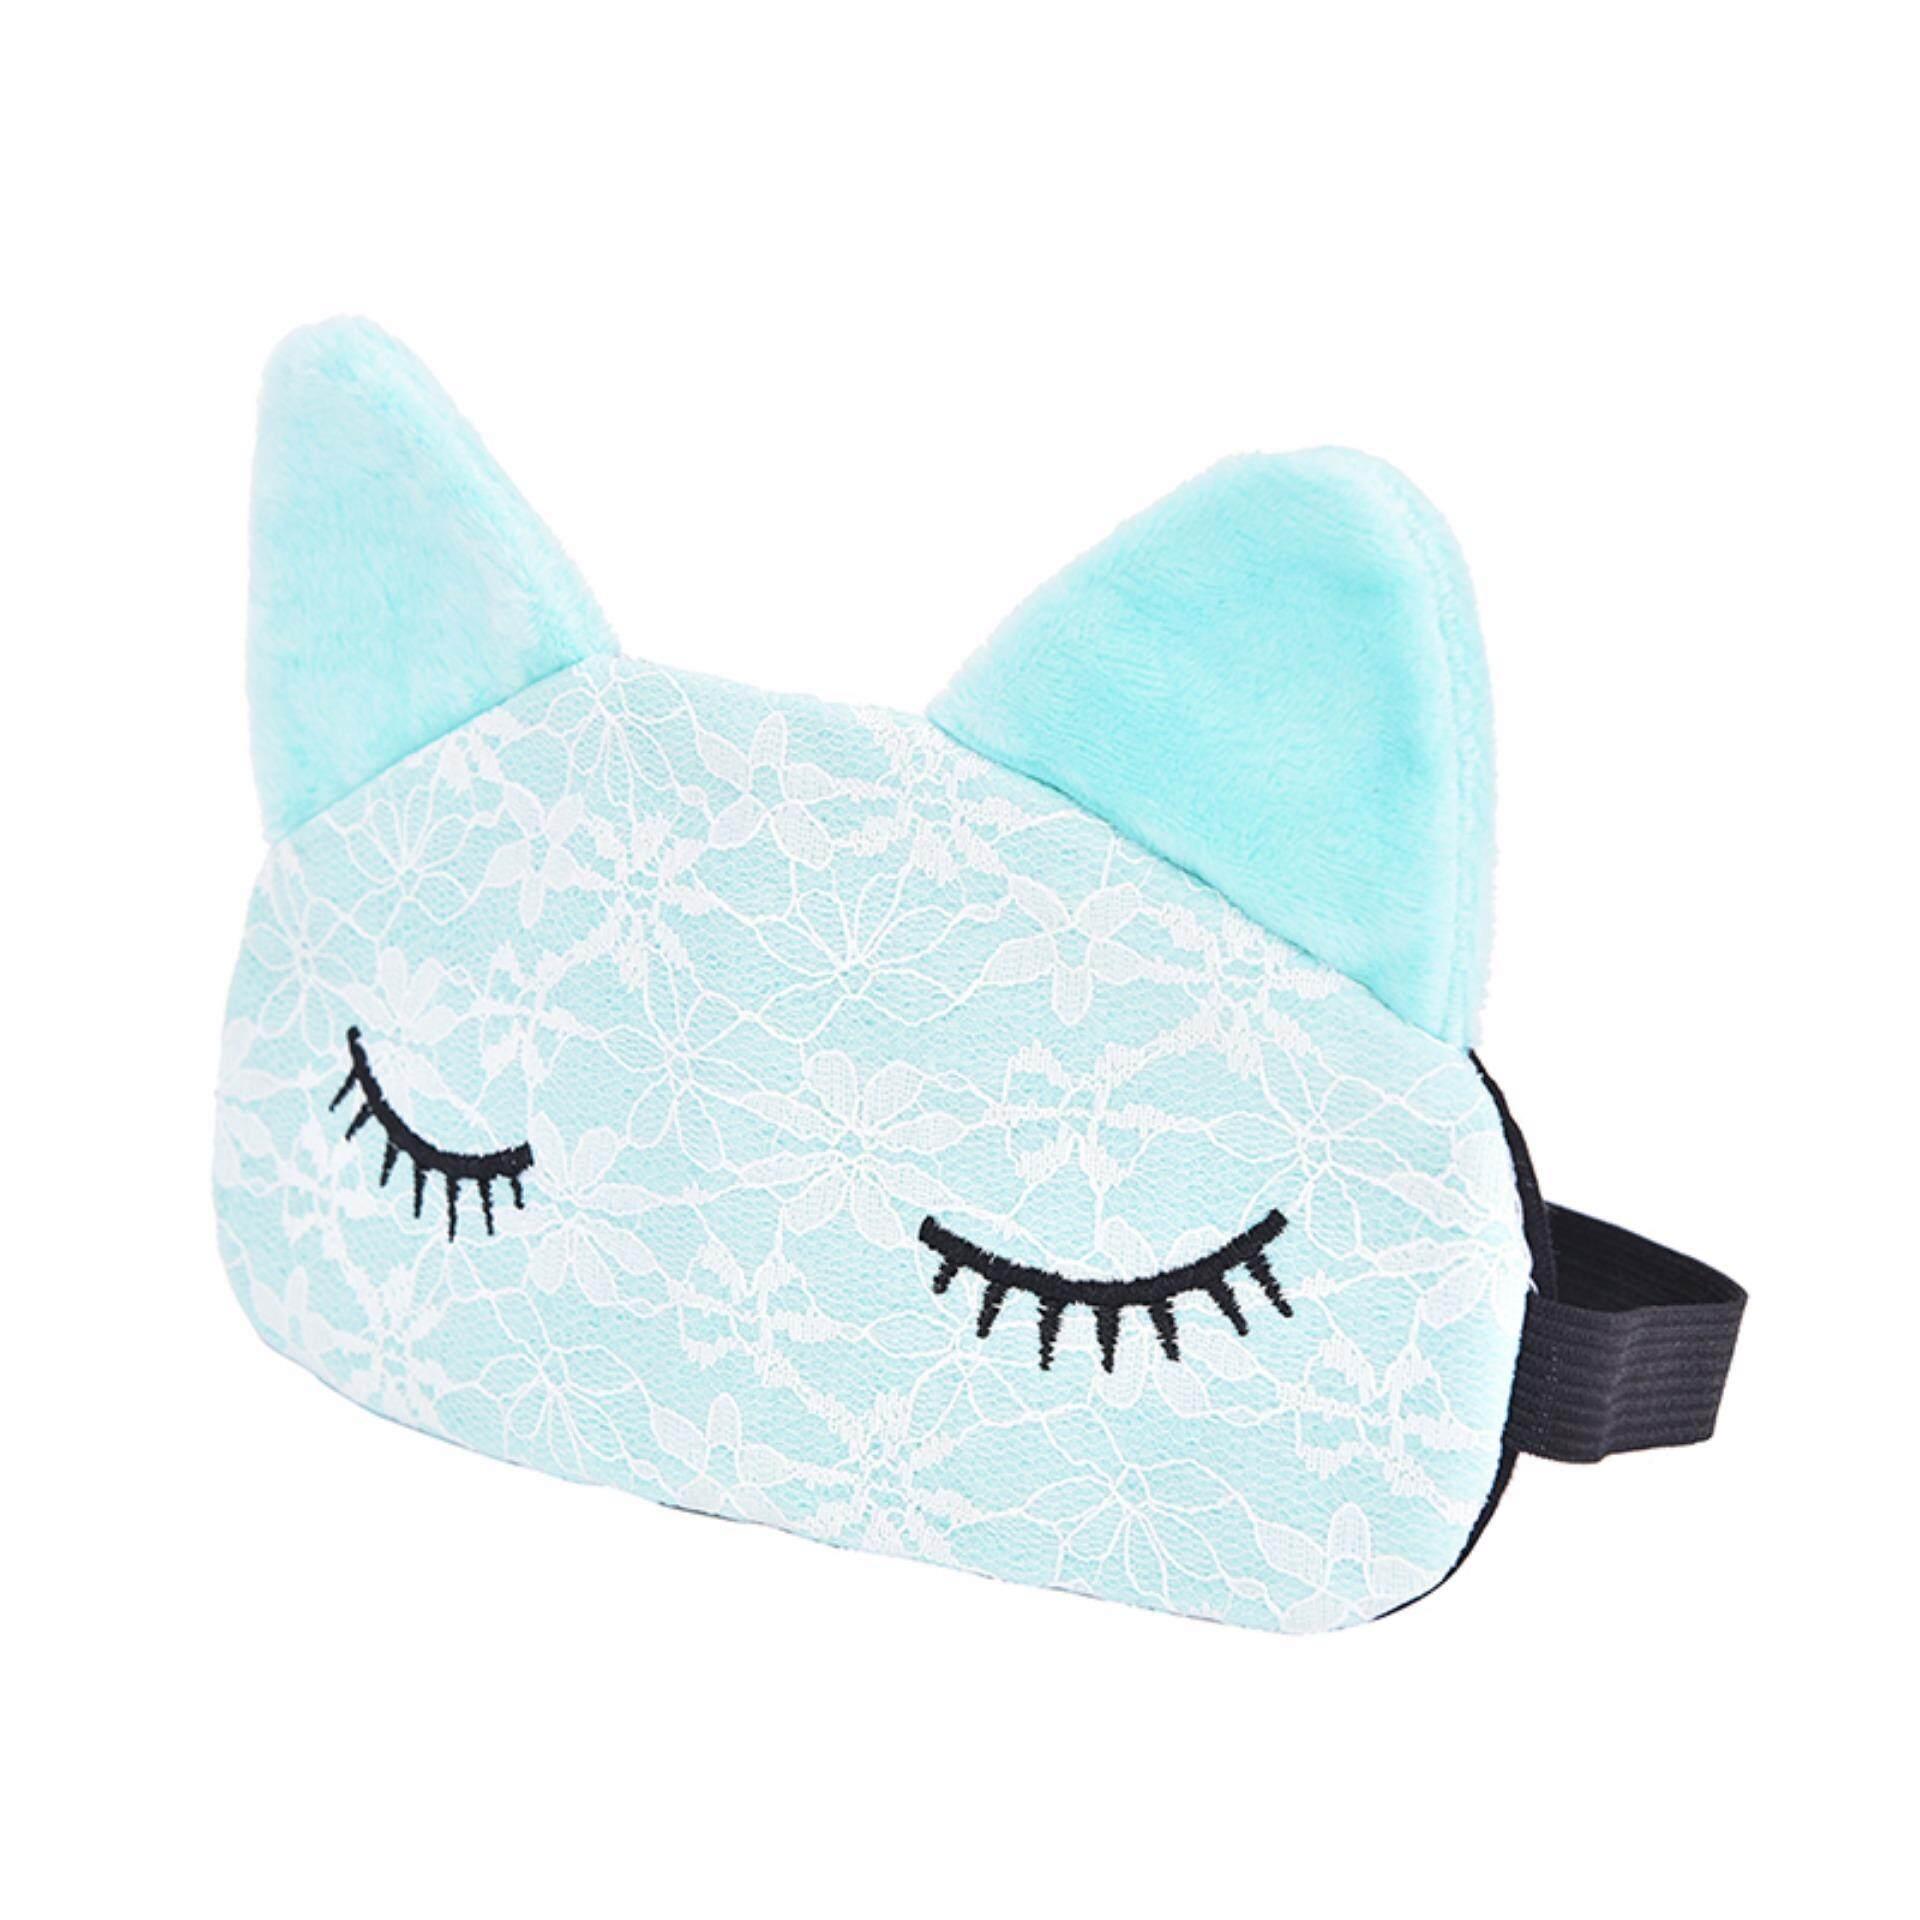 Masker Mata Penutup Mata Perjalanan Tidur Tidur Tudung Penutup Lembut Istirahat Empuk Membantu Bersantai Pink